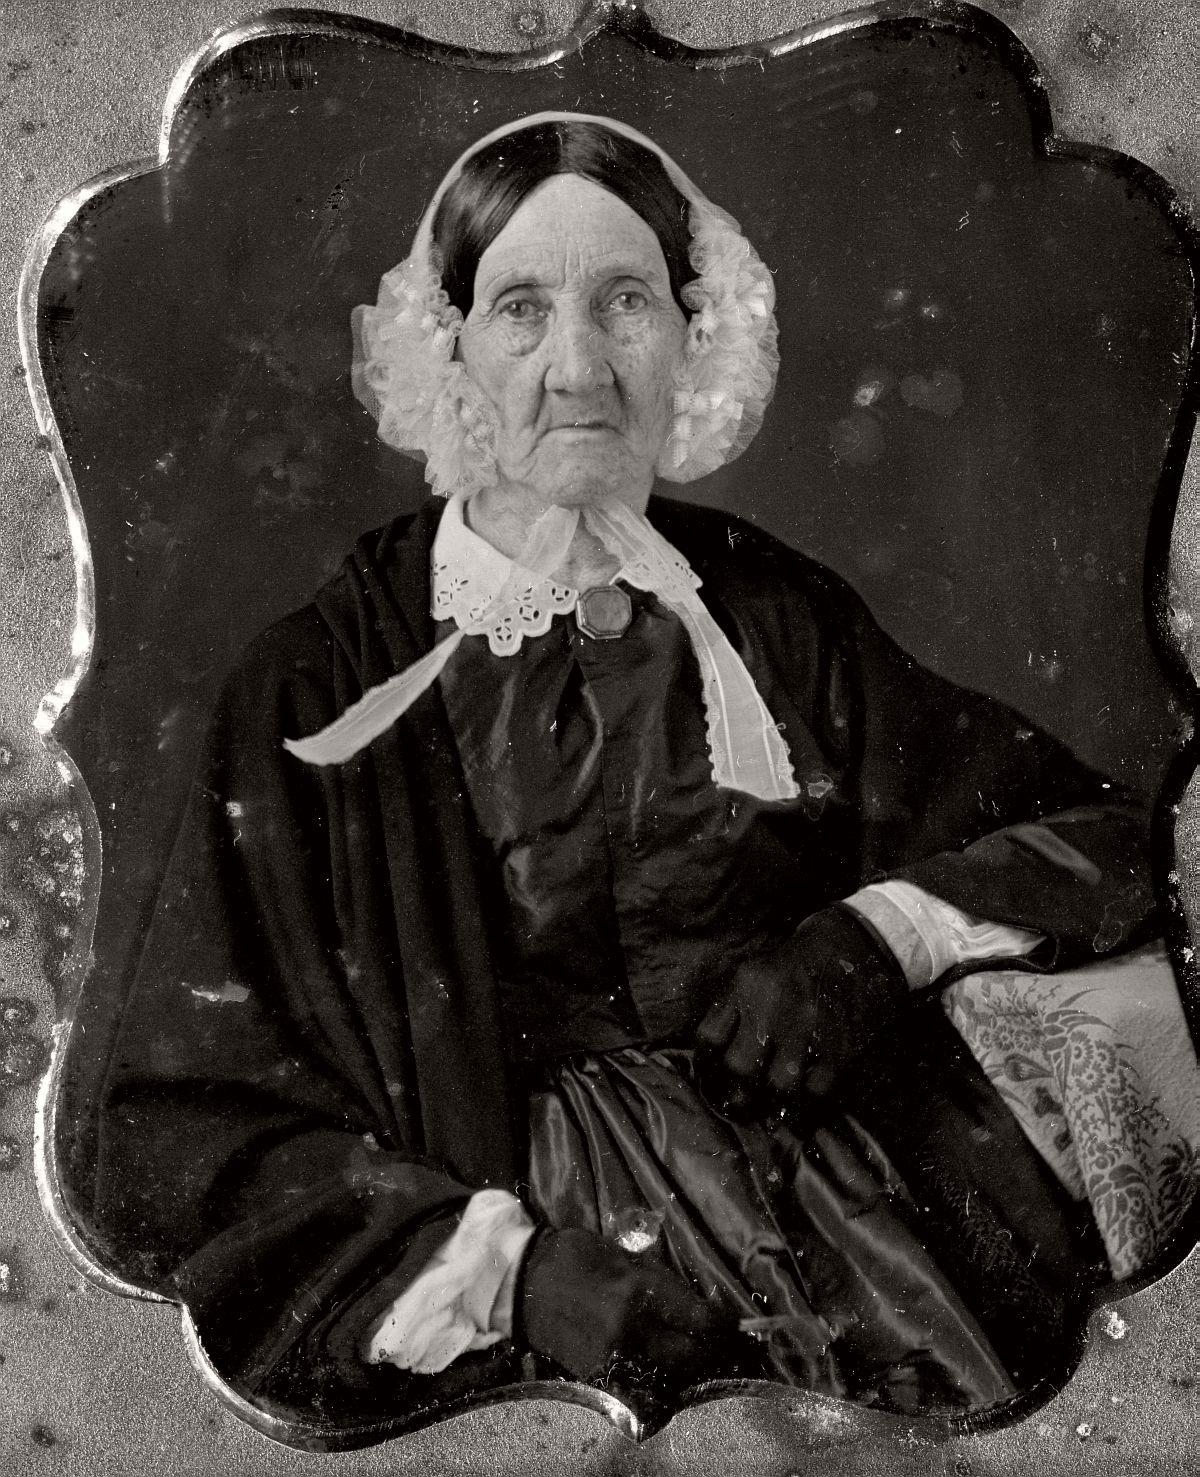 daguerreotype-portrait-ladies-born-in-the-late-18th-century-1700s-vintage-02